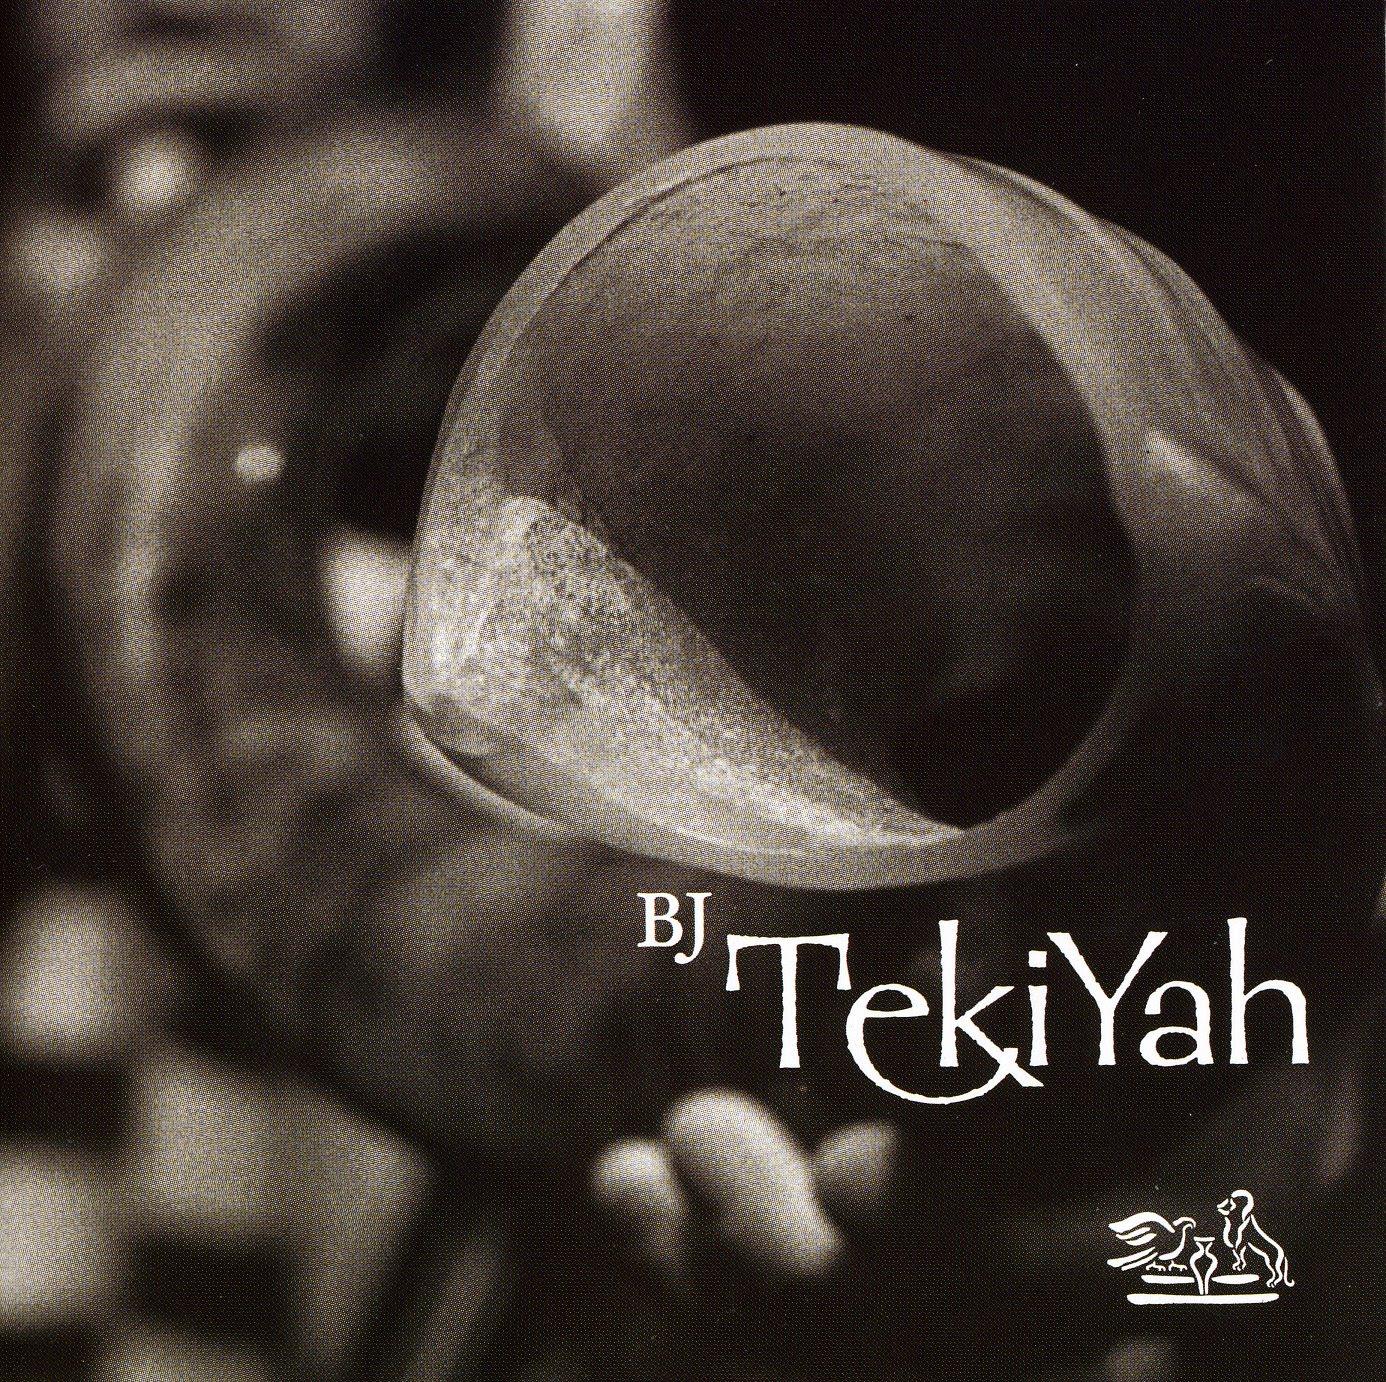 http://ak1.ostkcdn.com/images/products/3024770//bmmg/ent/Bnei-Jeshurun-TekiYah-High-Holy-Days-L737138707920.JPG